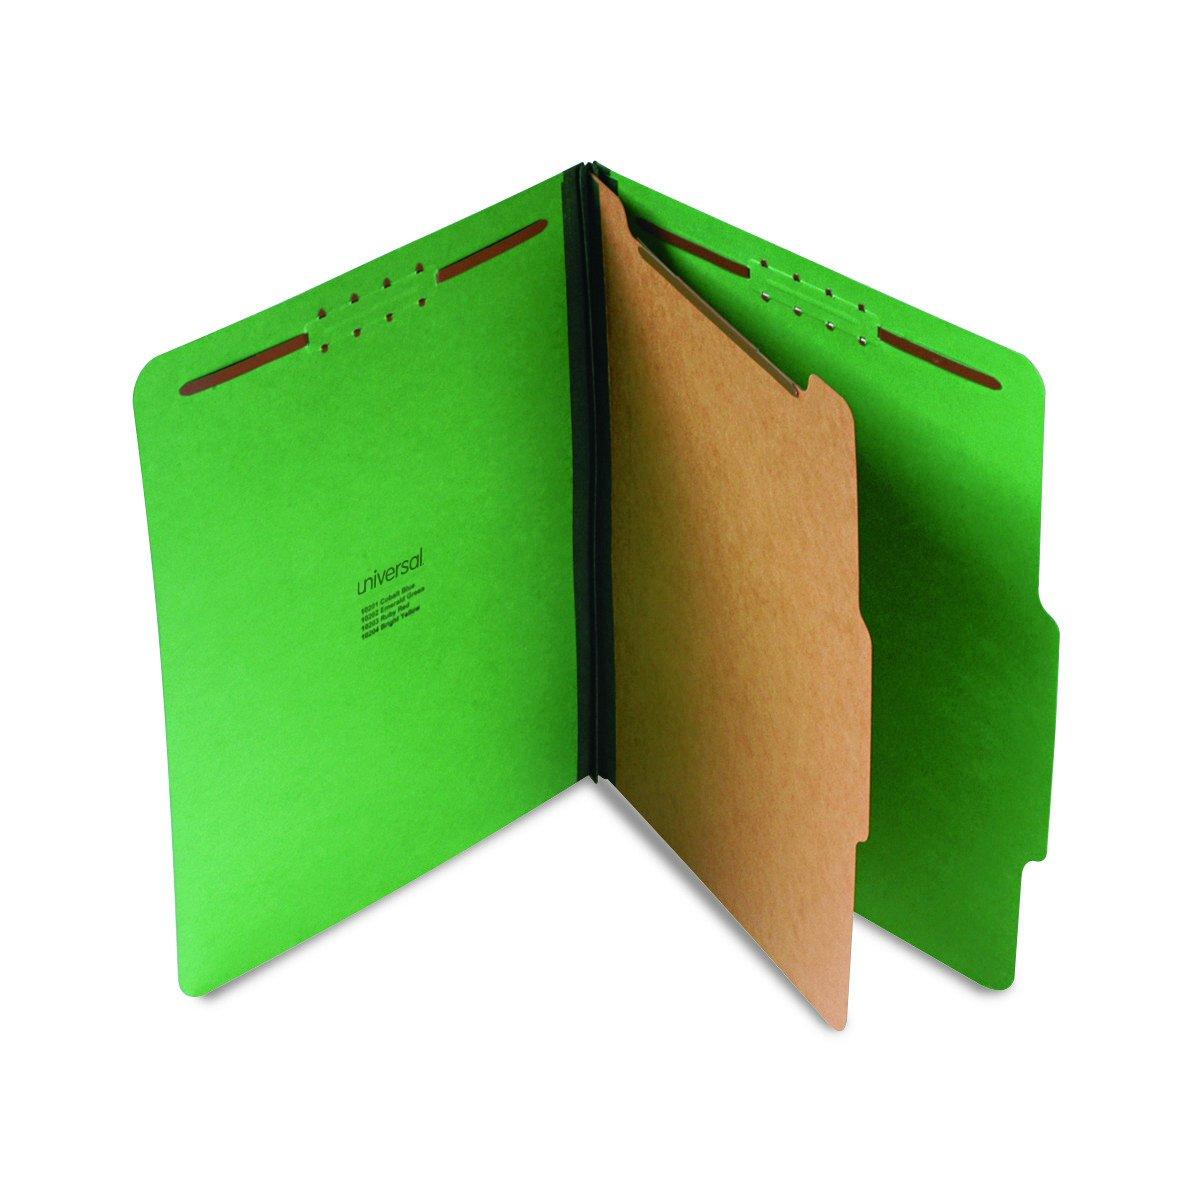 Universal 10202 Pressboard Folder, Letter, Four-Section, Emerald Green (Box of 10)